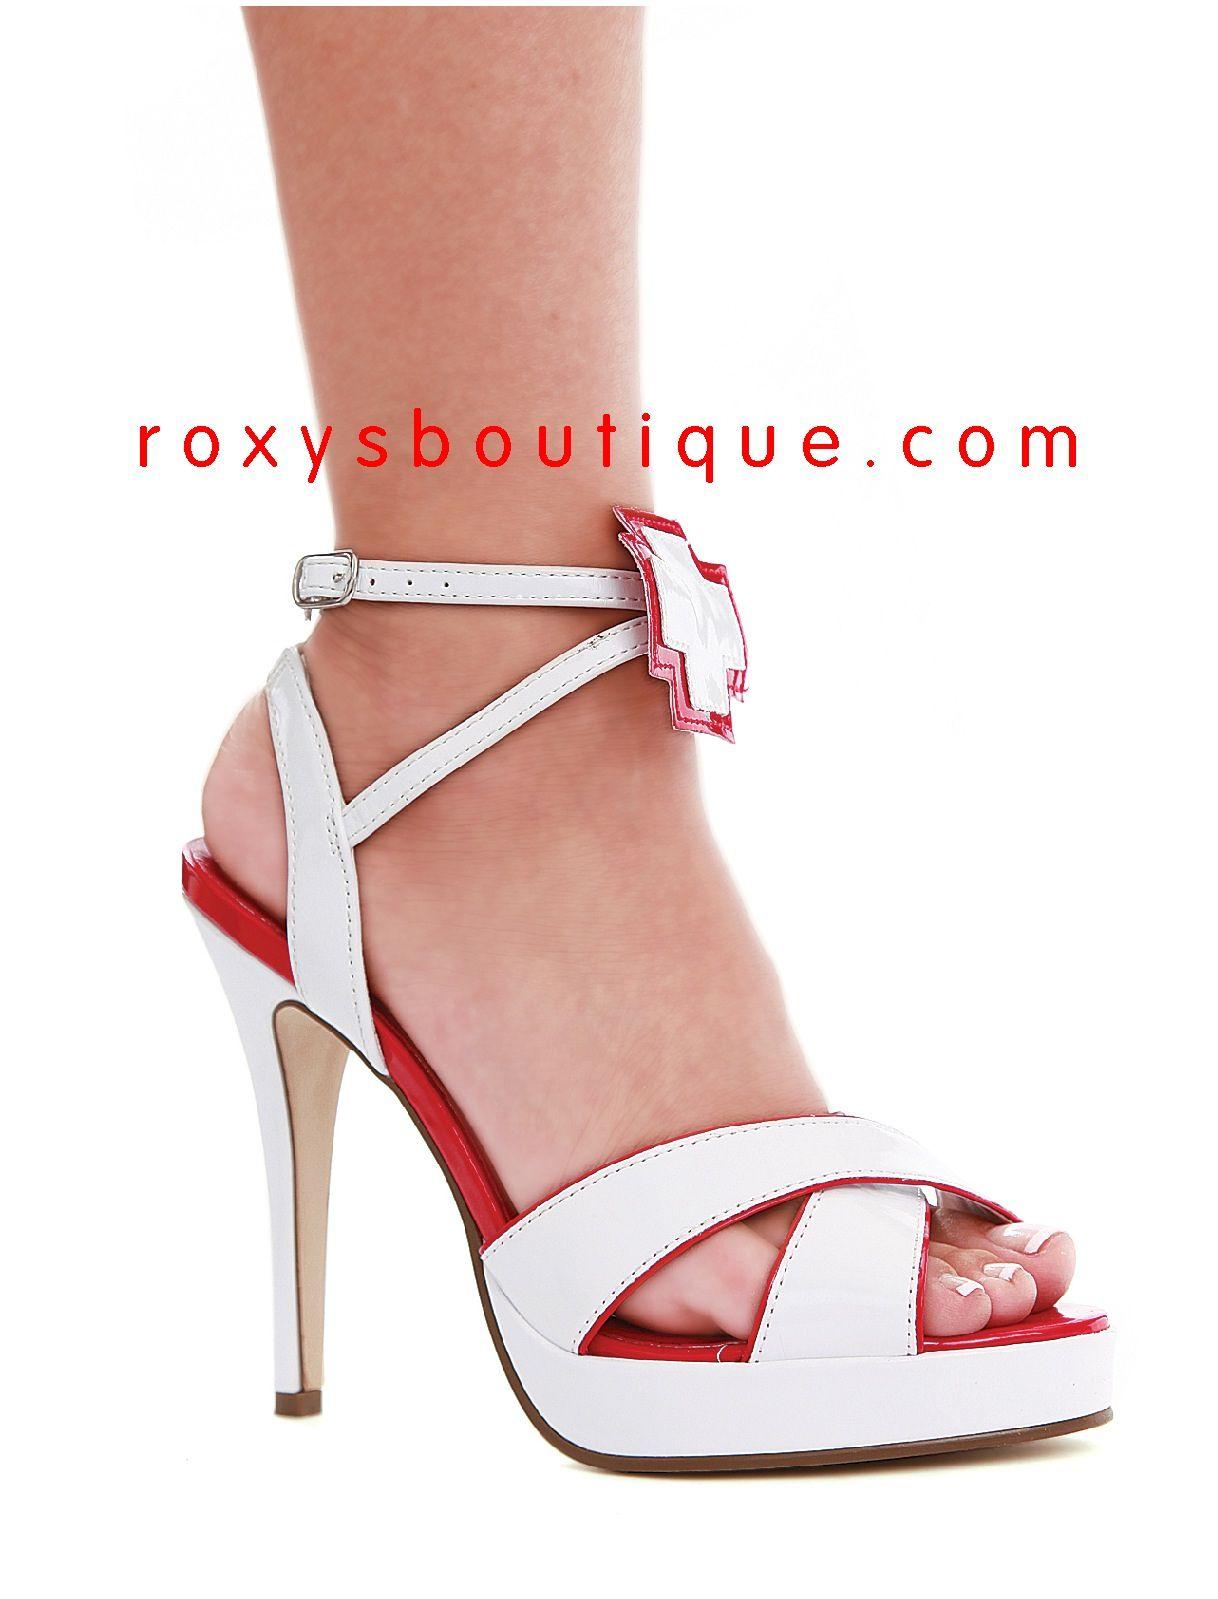 4a28f88e2969 Nurse sandals with ankle strap